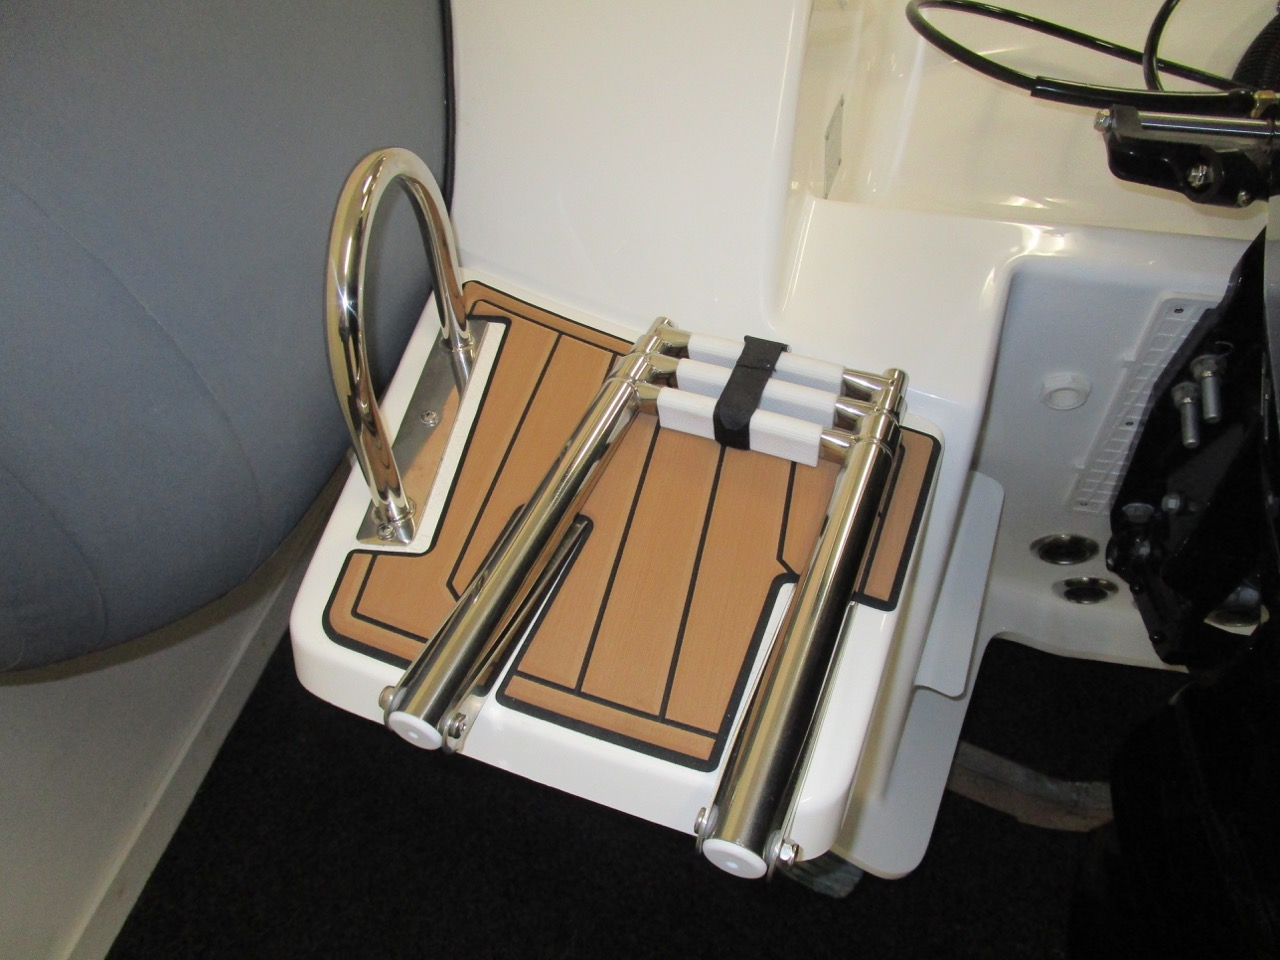 E780 boarding ladder secure for sea